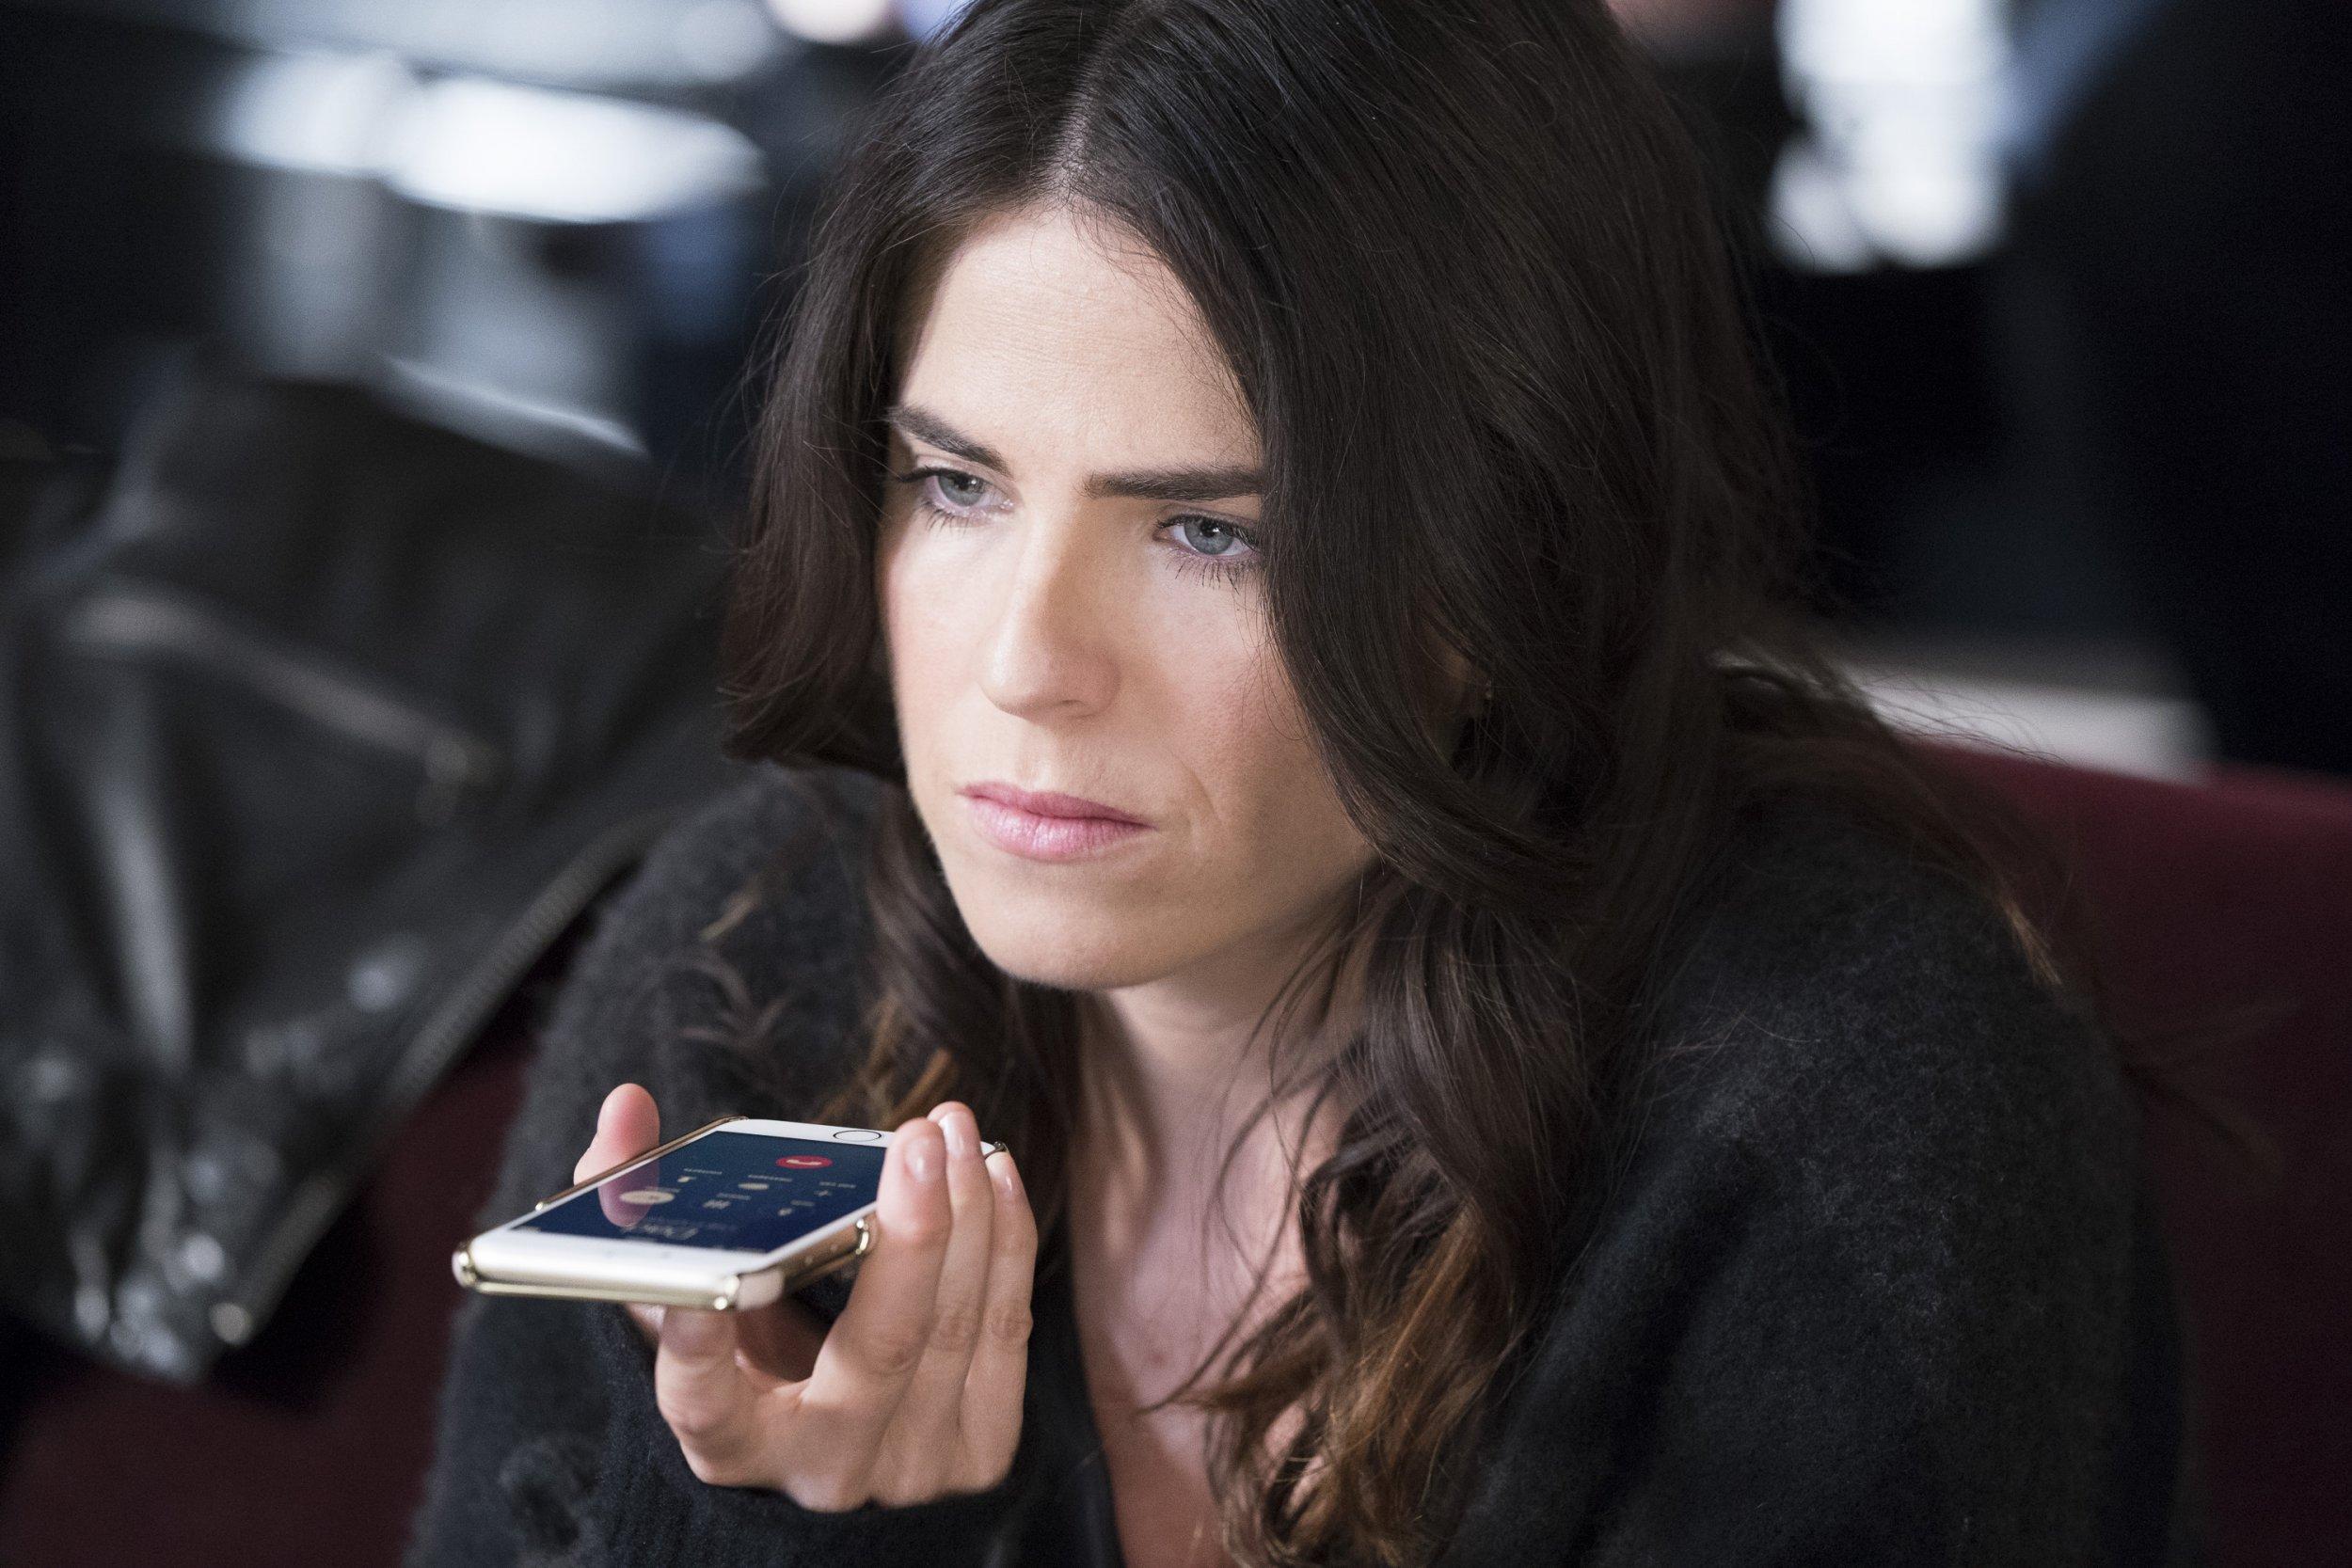 How to Get Away With Murder Laurel